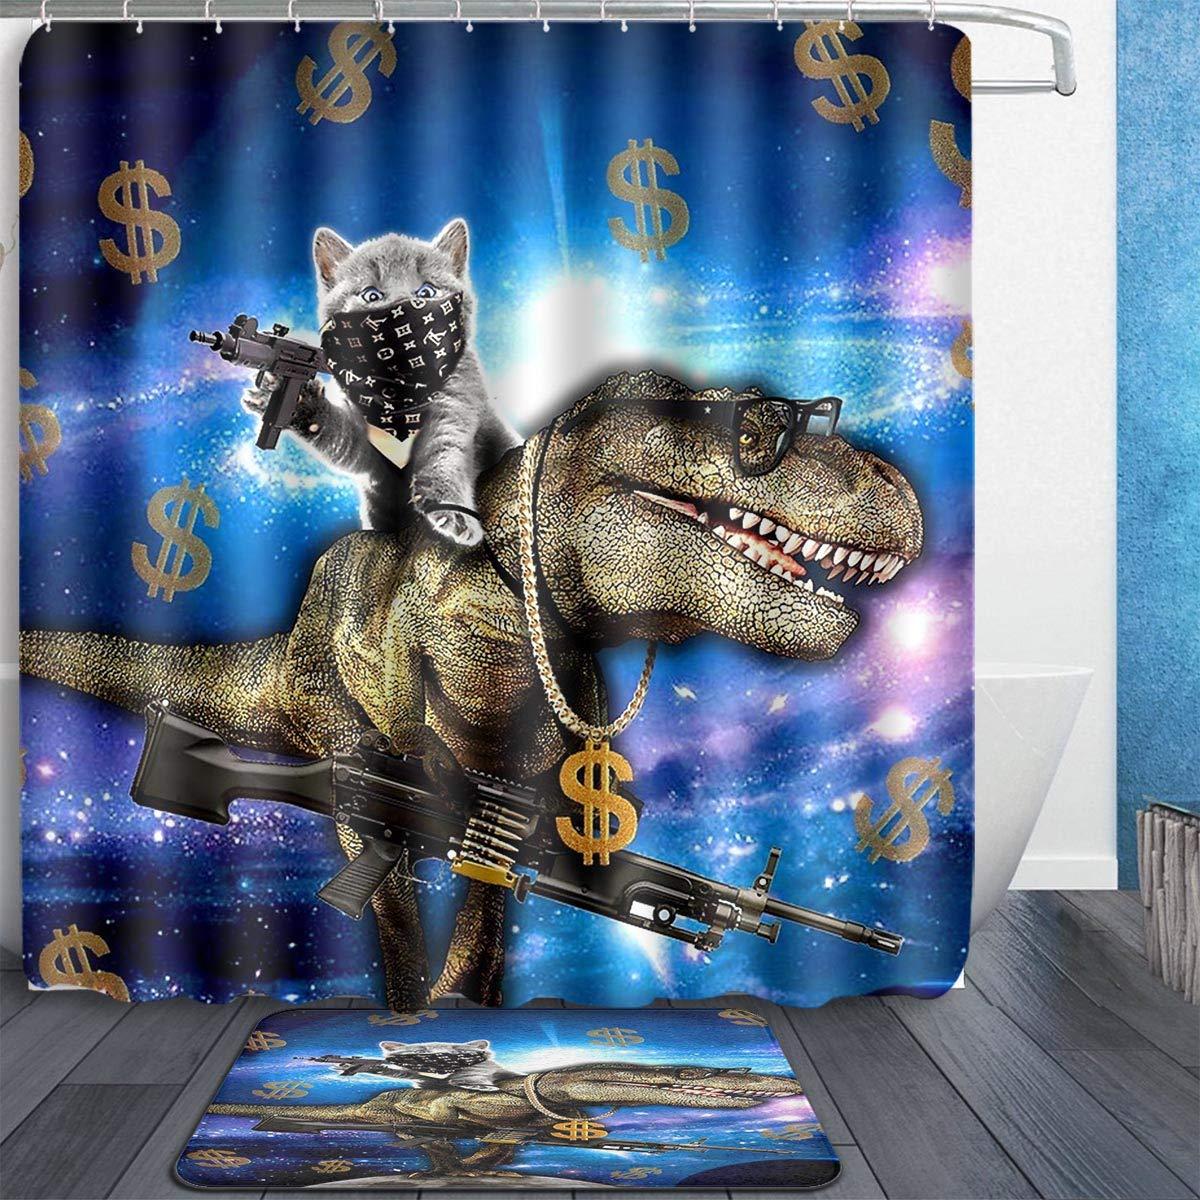 Space Cat Riding Dinosaur T Rex With Guns Dollars Shower Curtain Shower Curtains Aliexpress